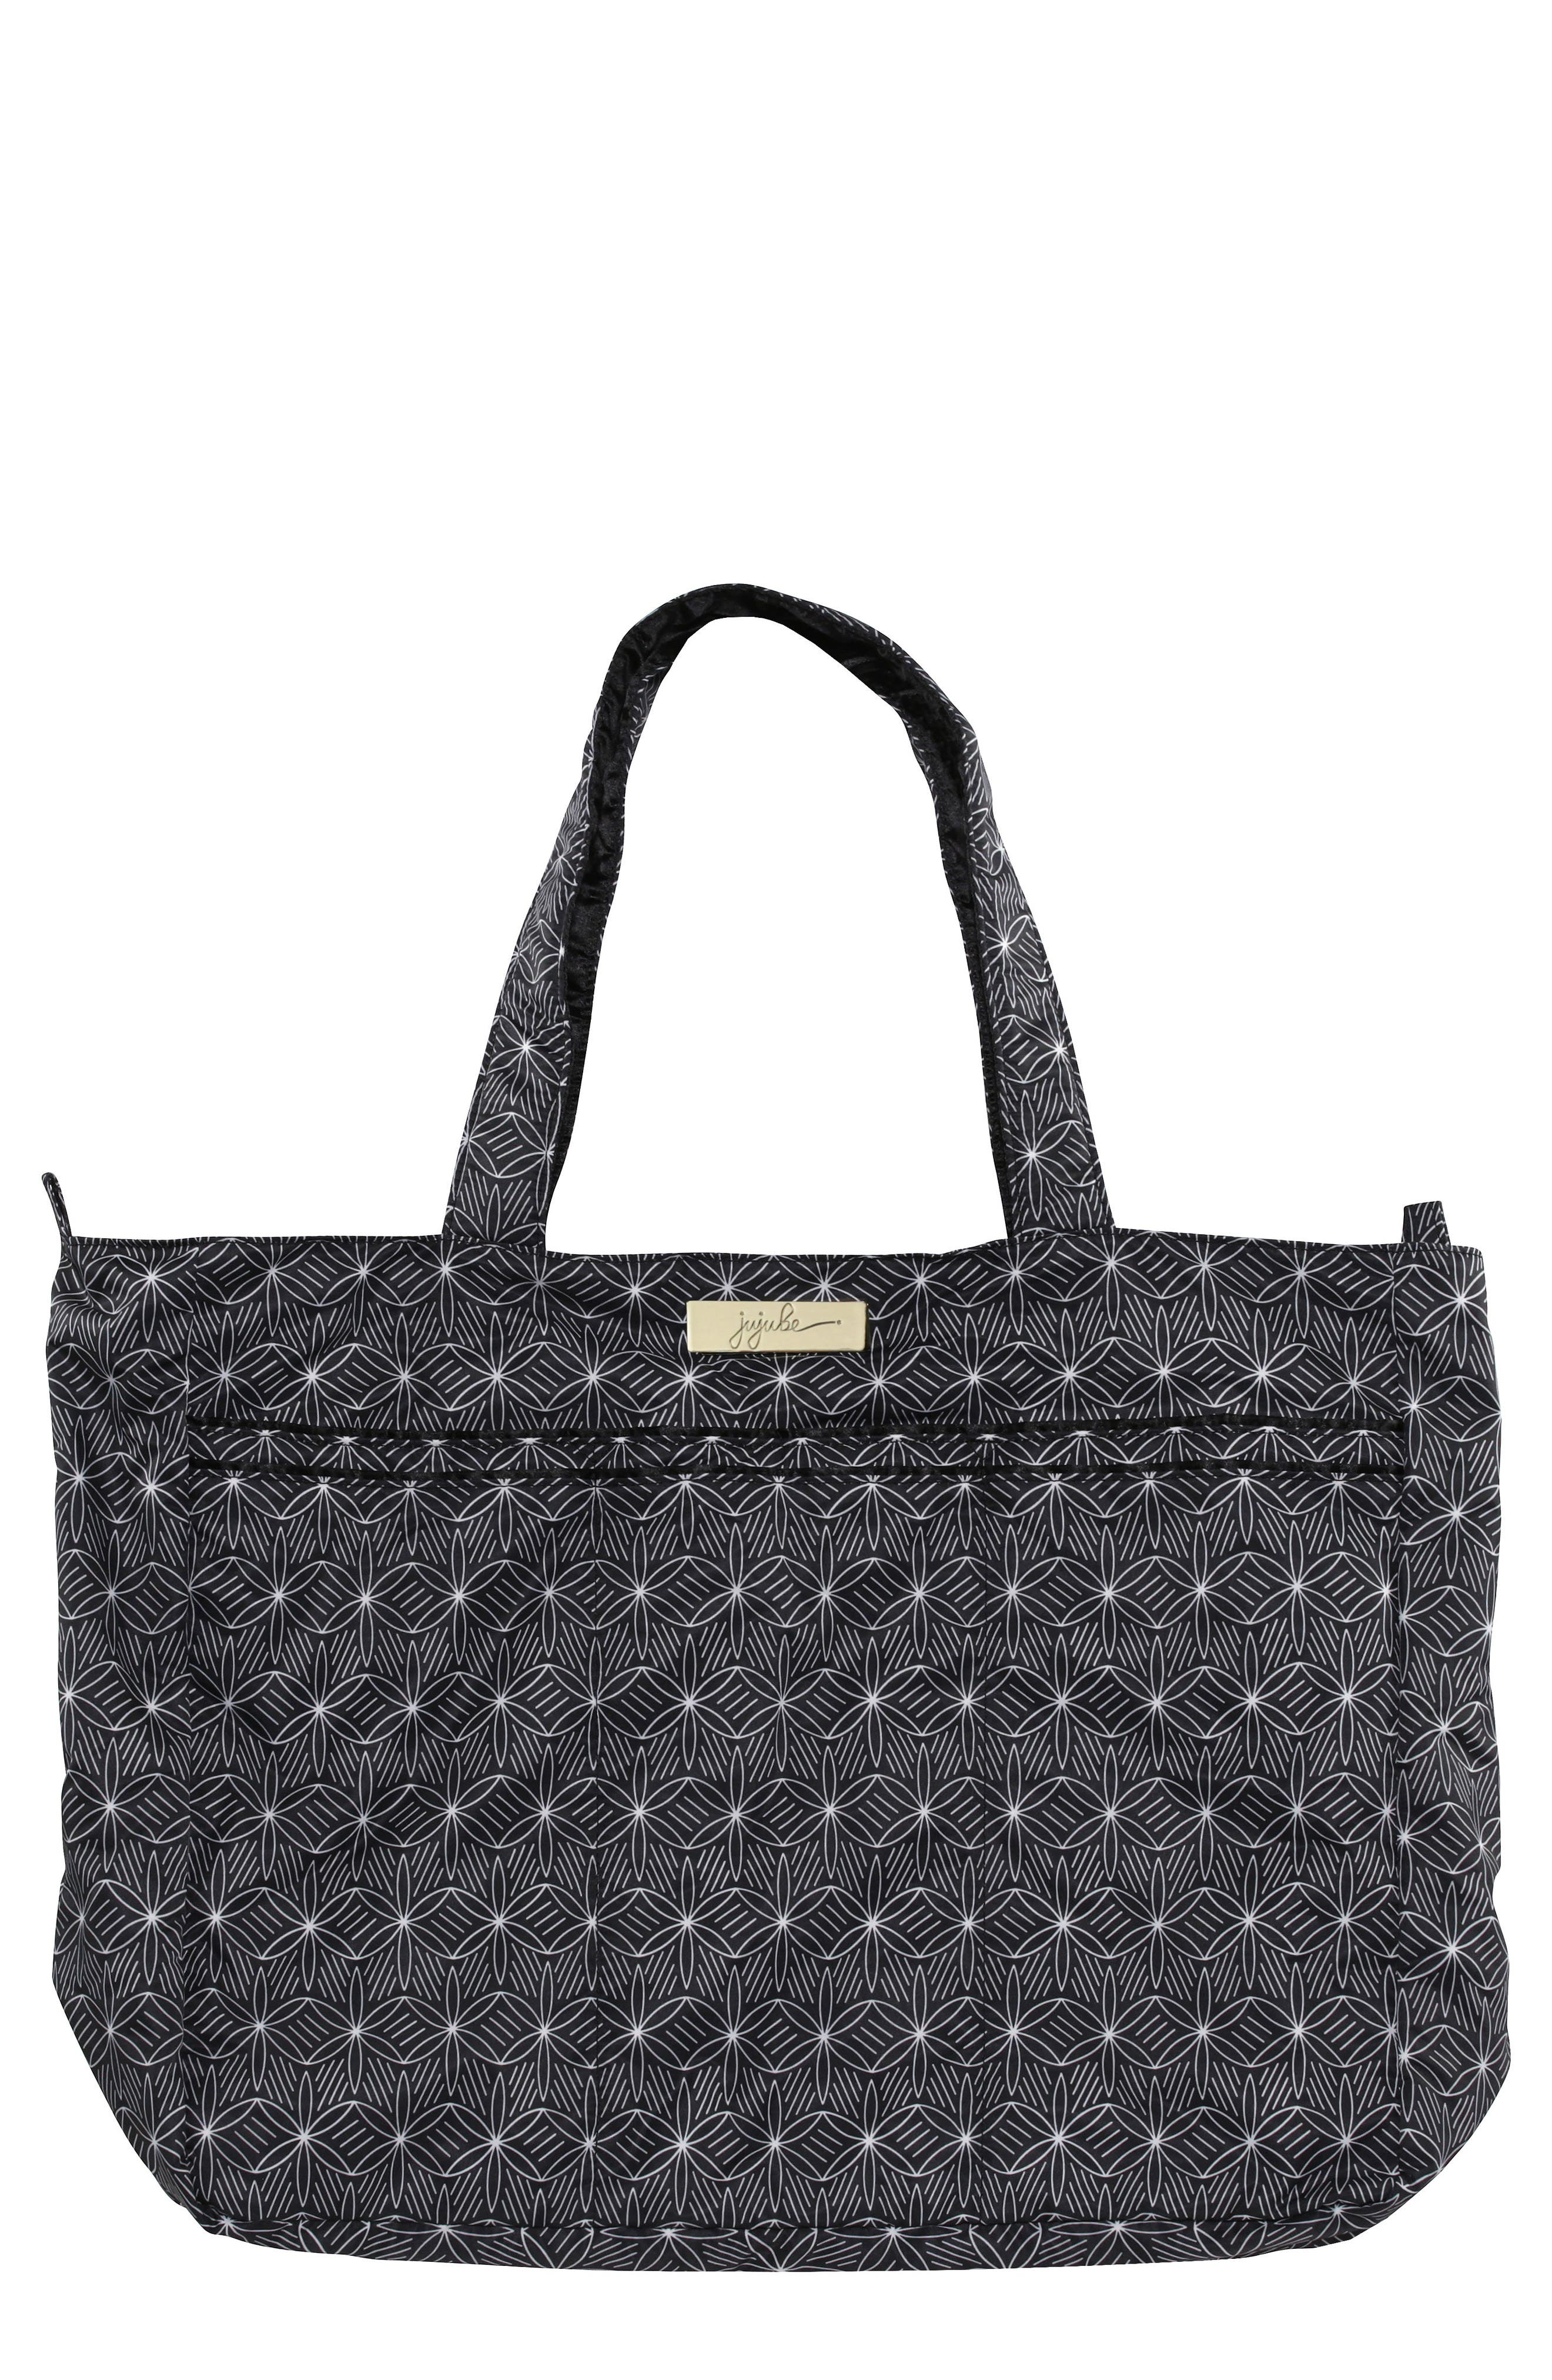 Main Image - Ju-Ju-Be 'Legacy Super Be - The First Lady' Diaper Bag